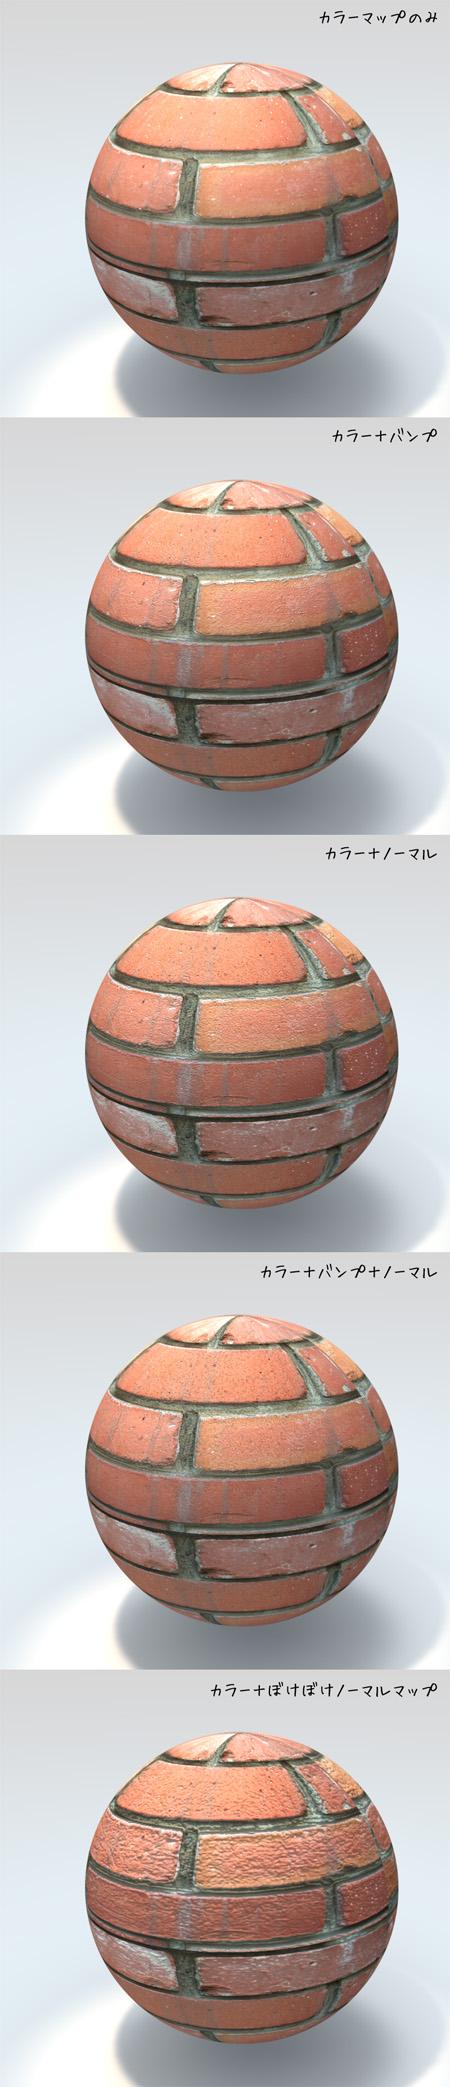 20110807_0006